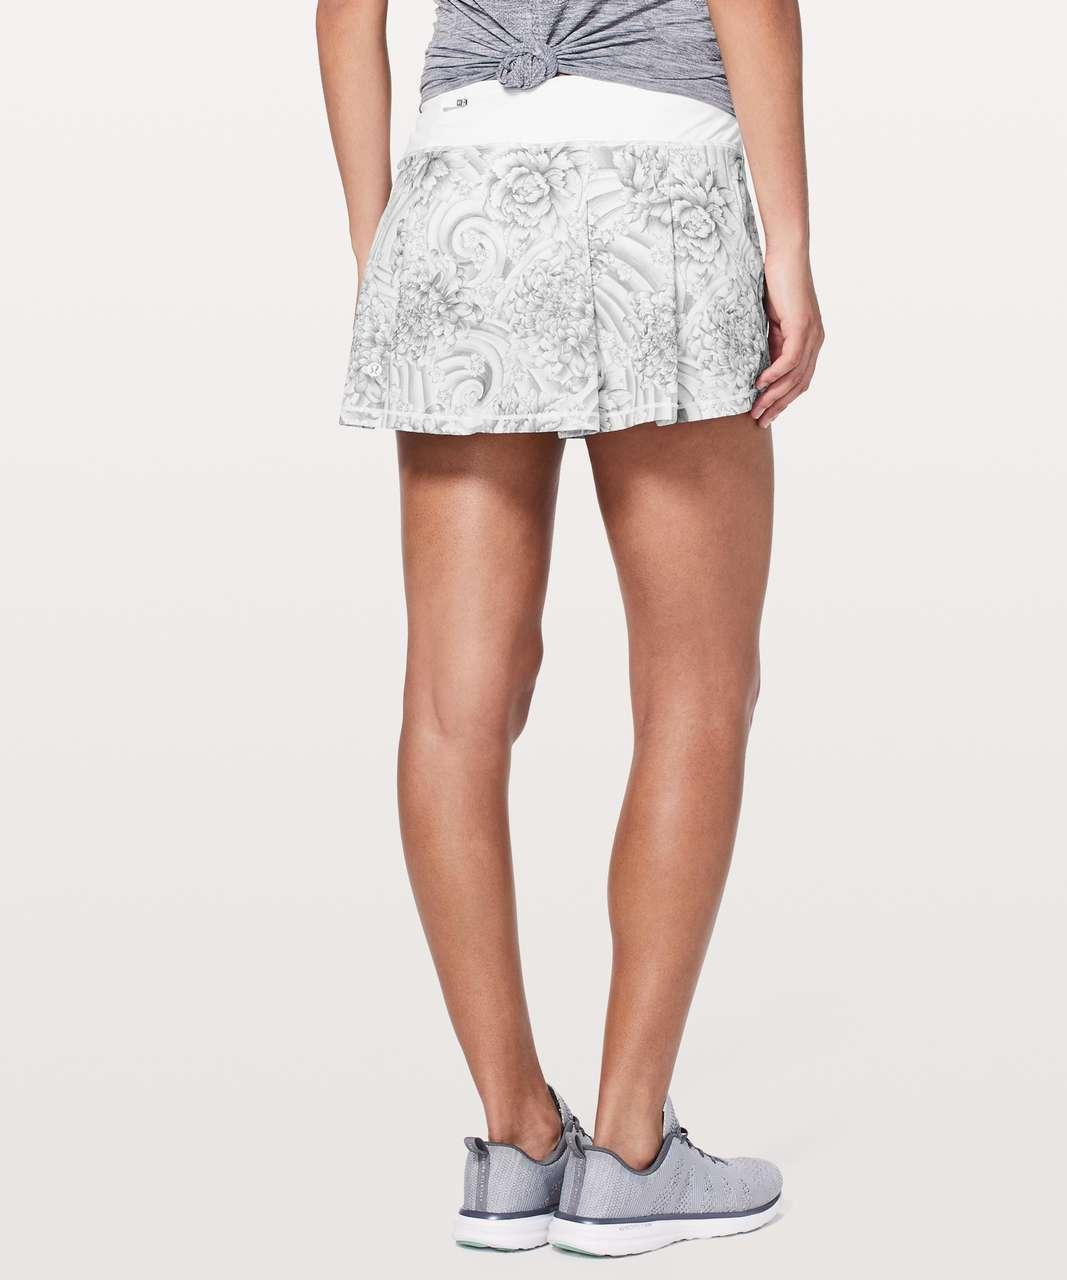 Lululemon Pace Rival Skirt (Regular) *No Panels - Mini Twine White Multi / White